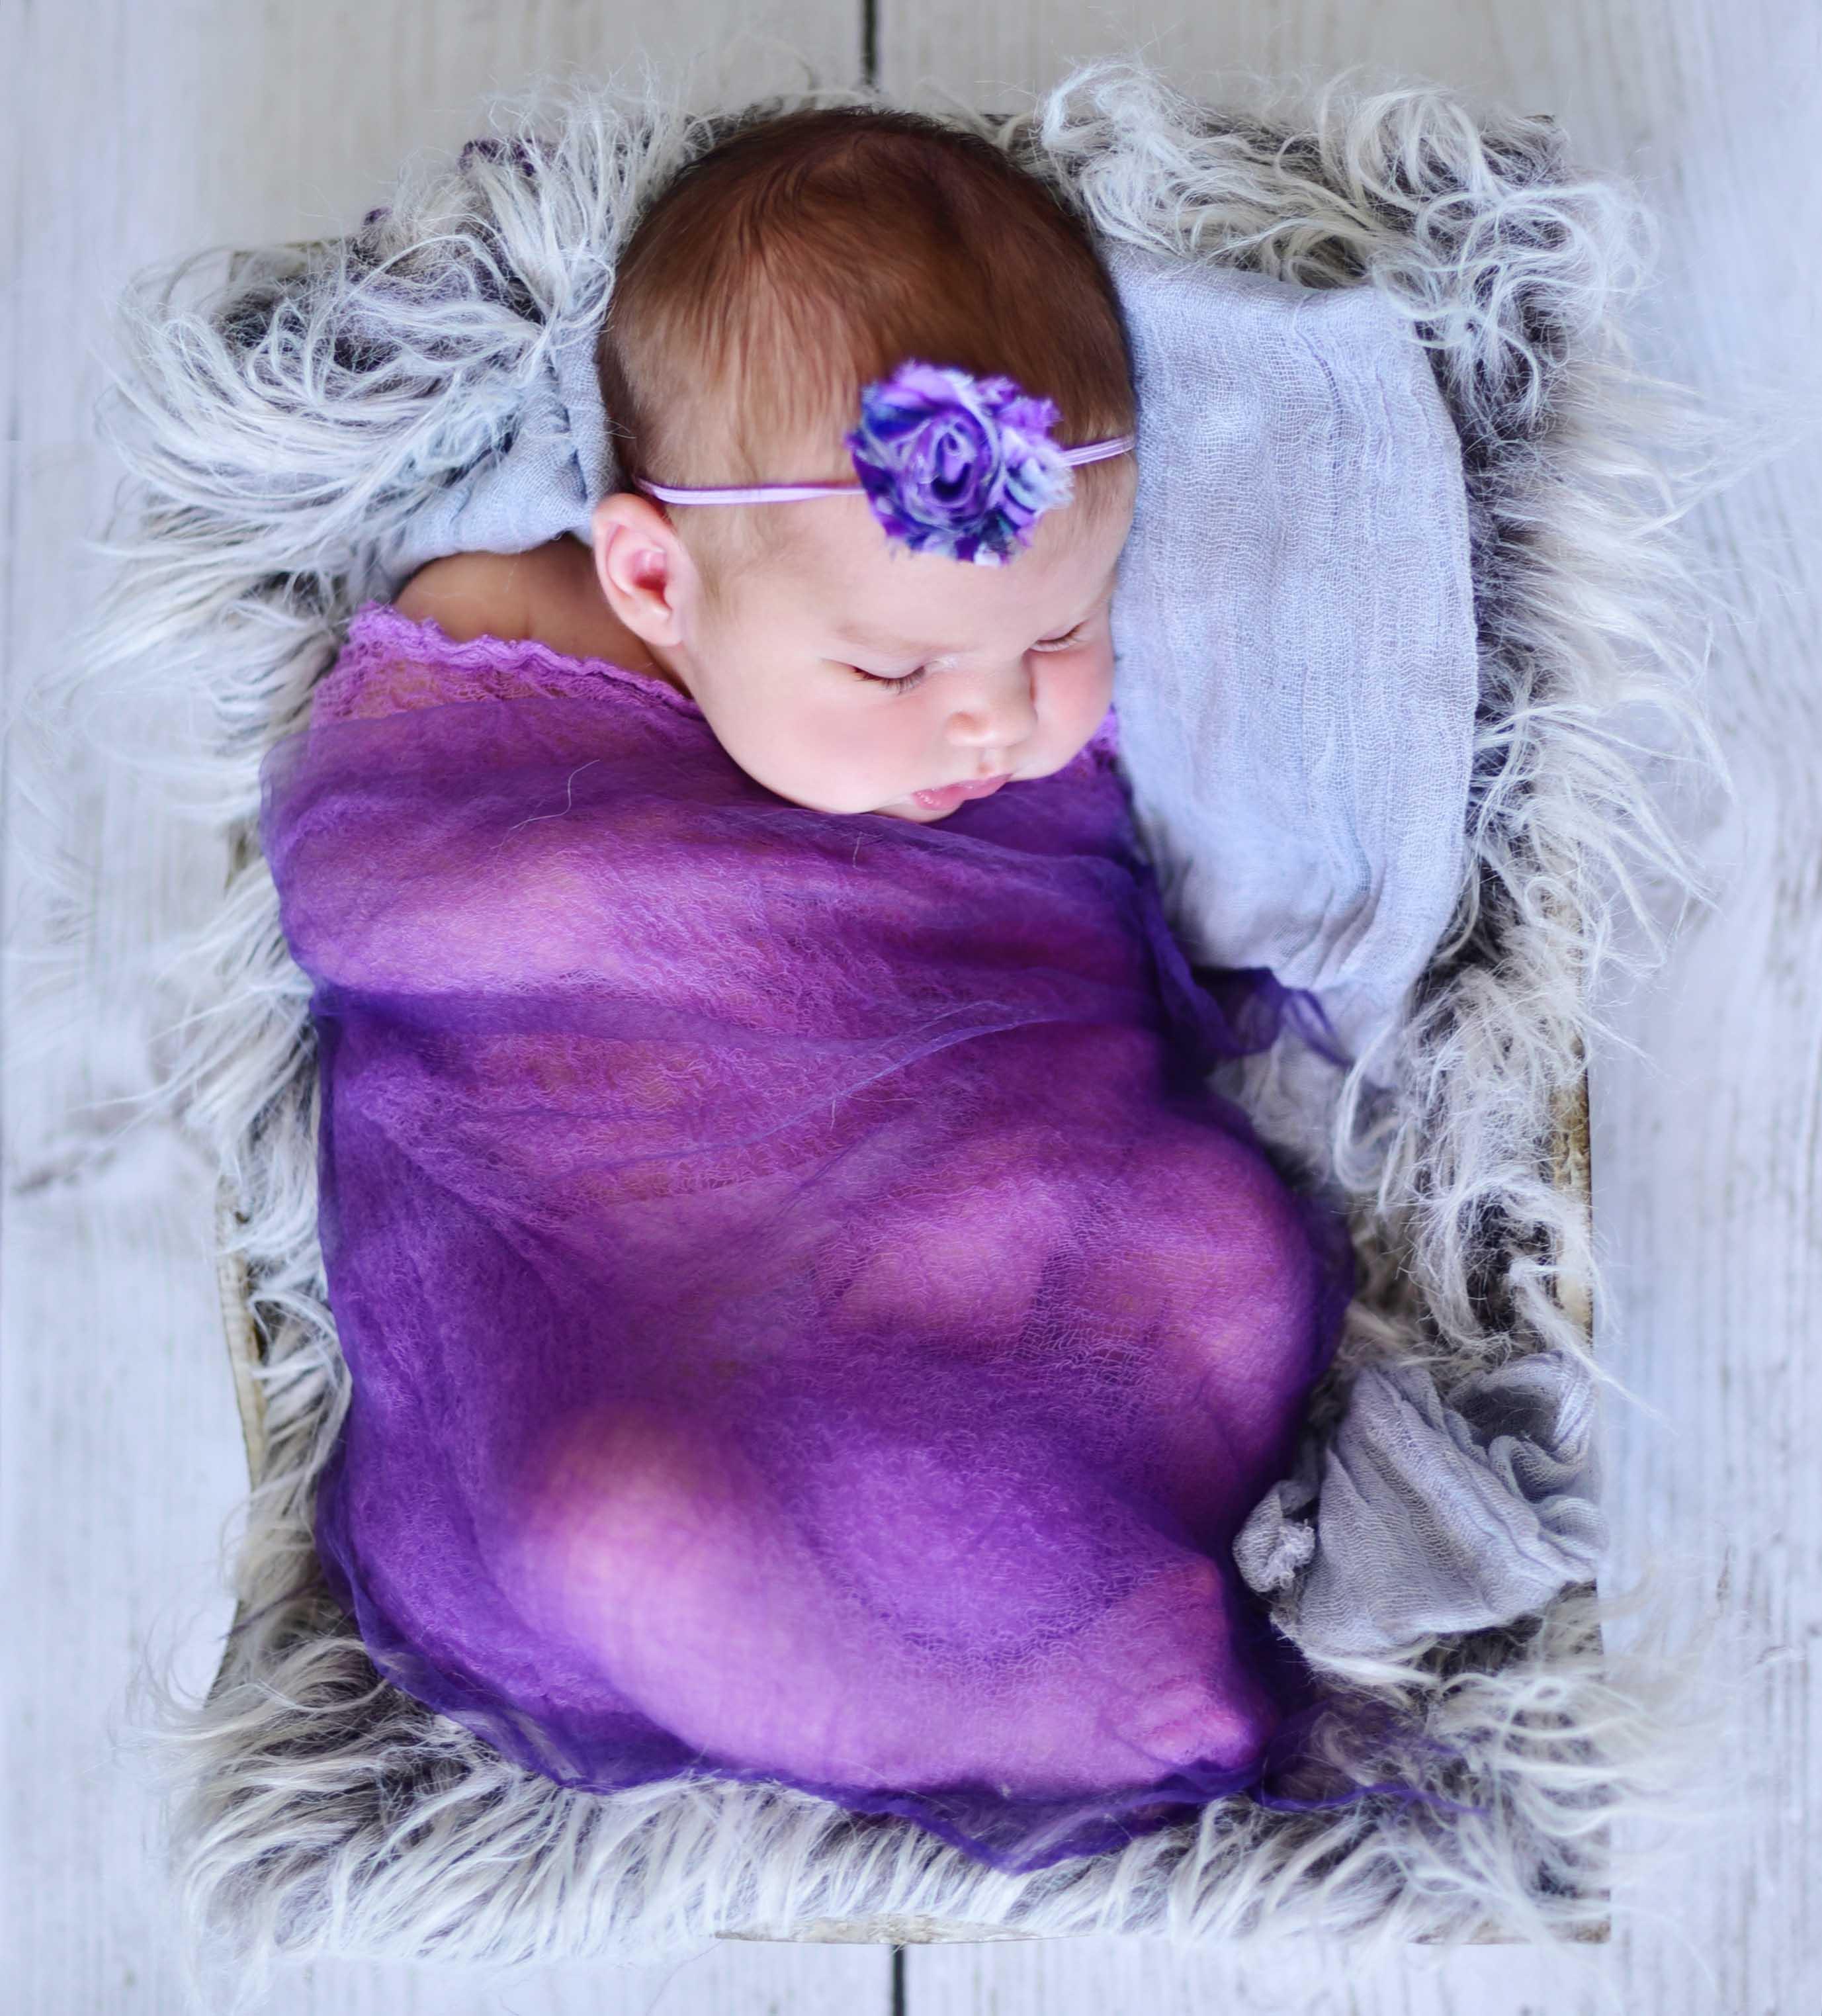 creative newborn portraits, baby images, michelle nyulassie, brighton, east sussex,